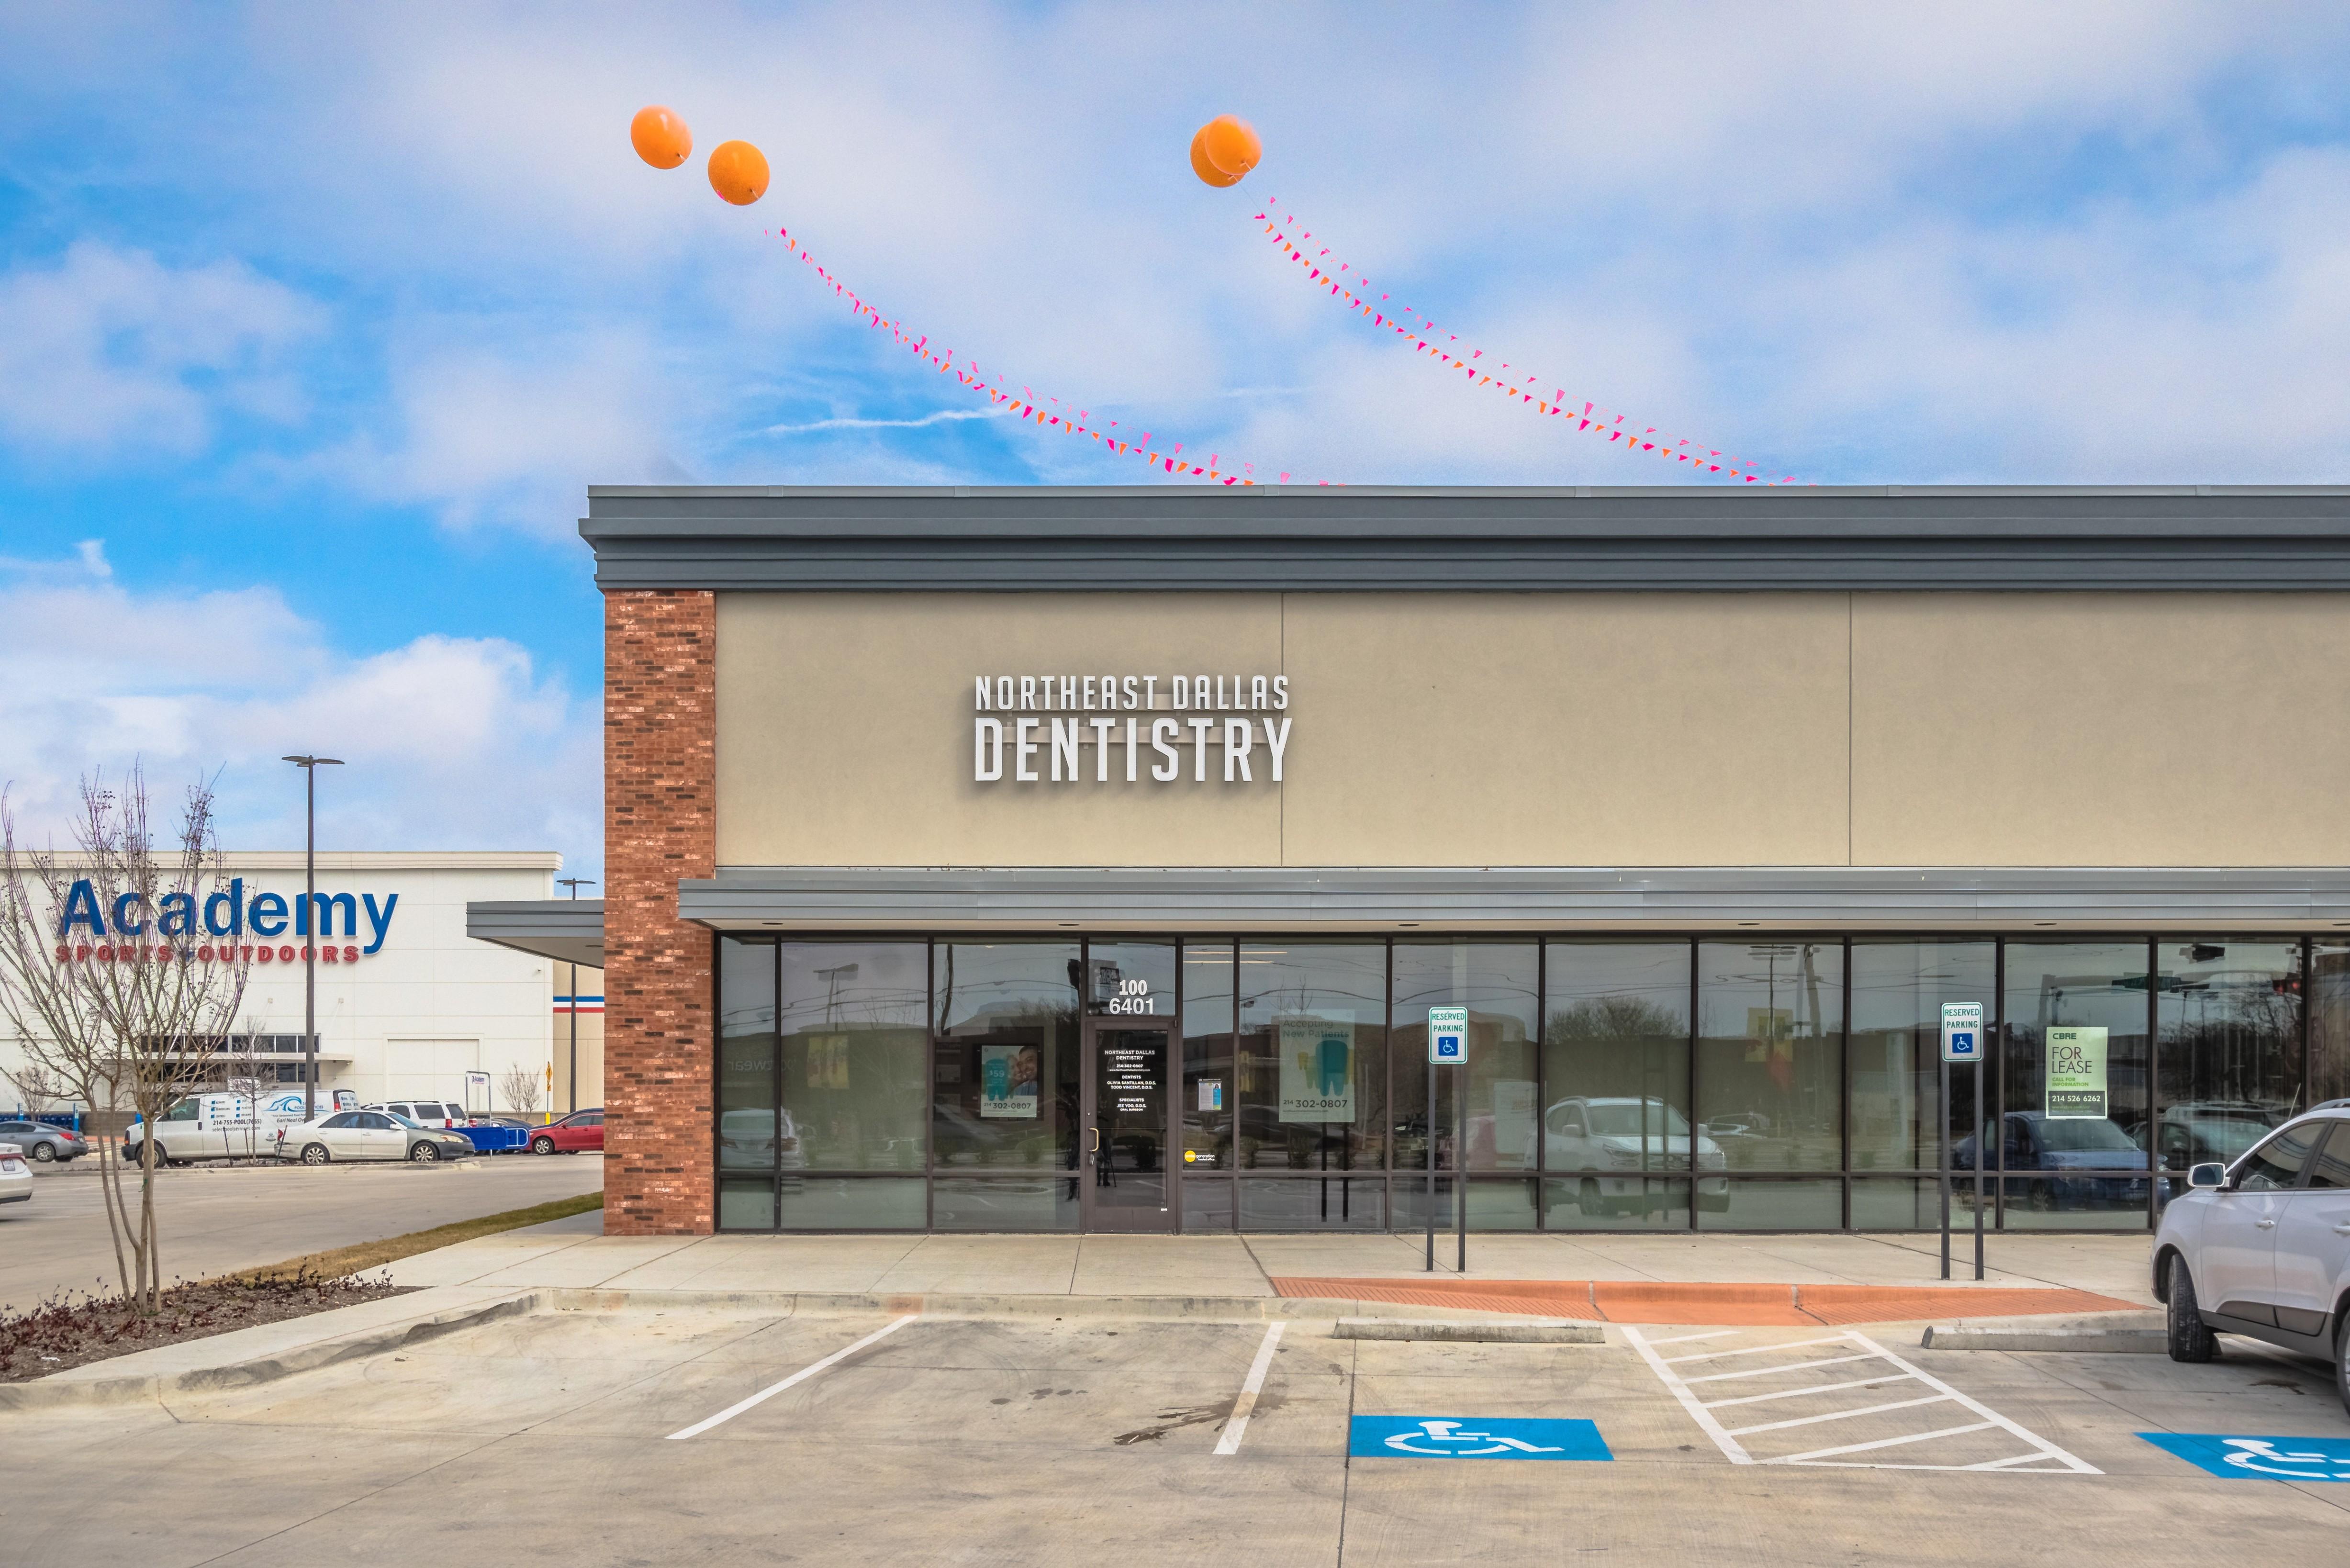 Northeast Dallas Dentistry